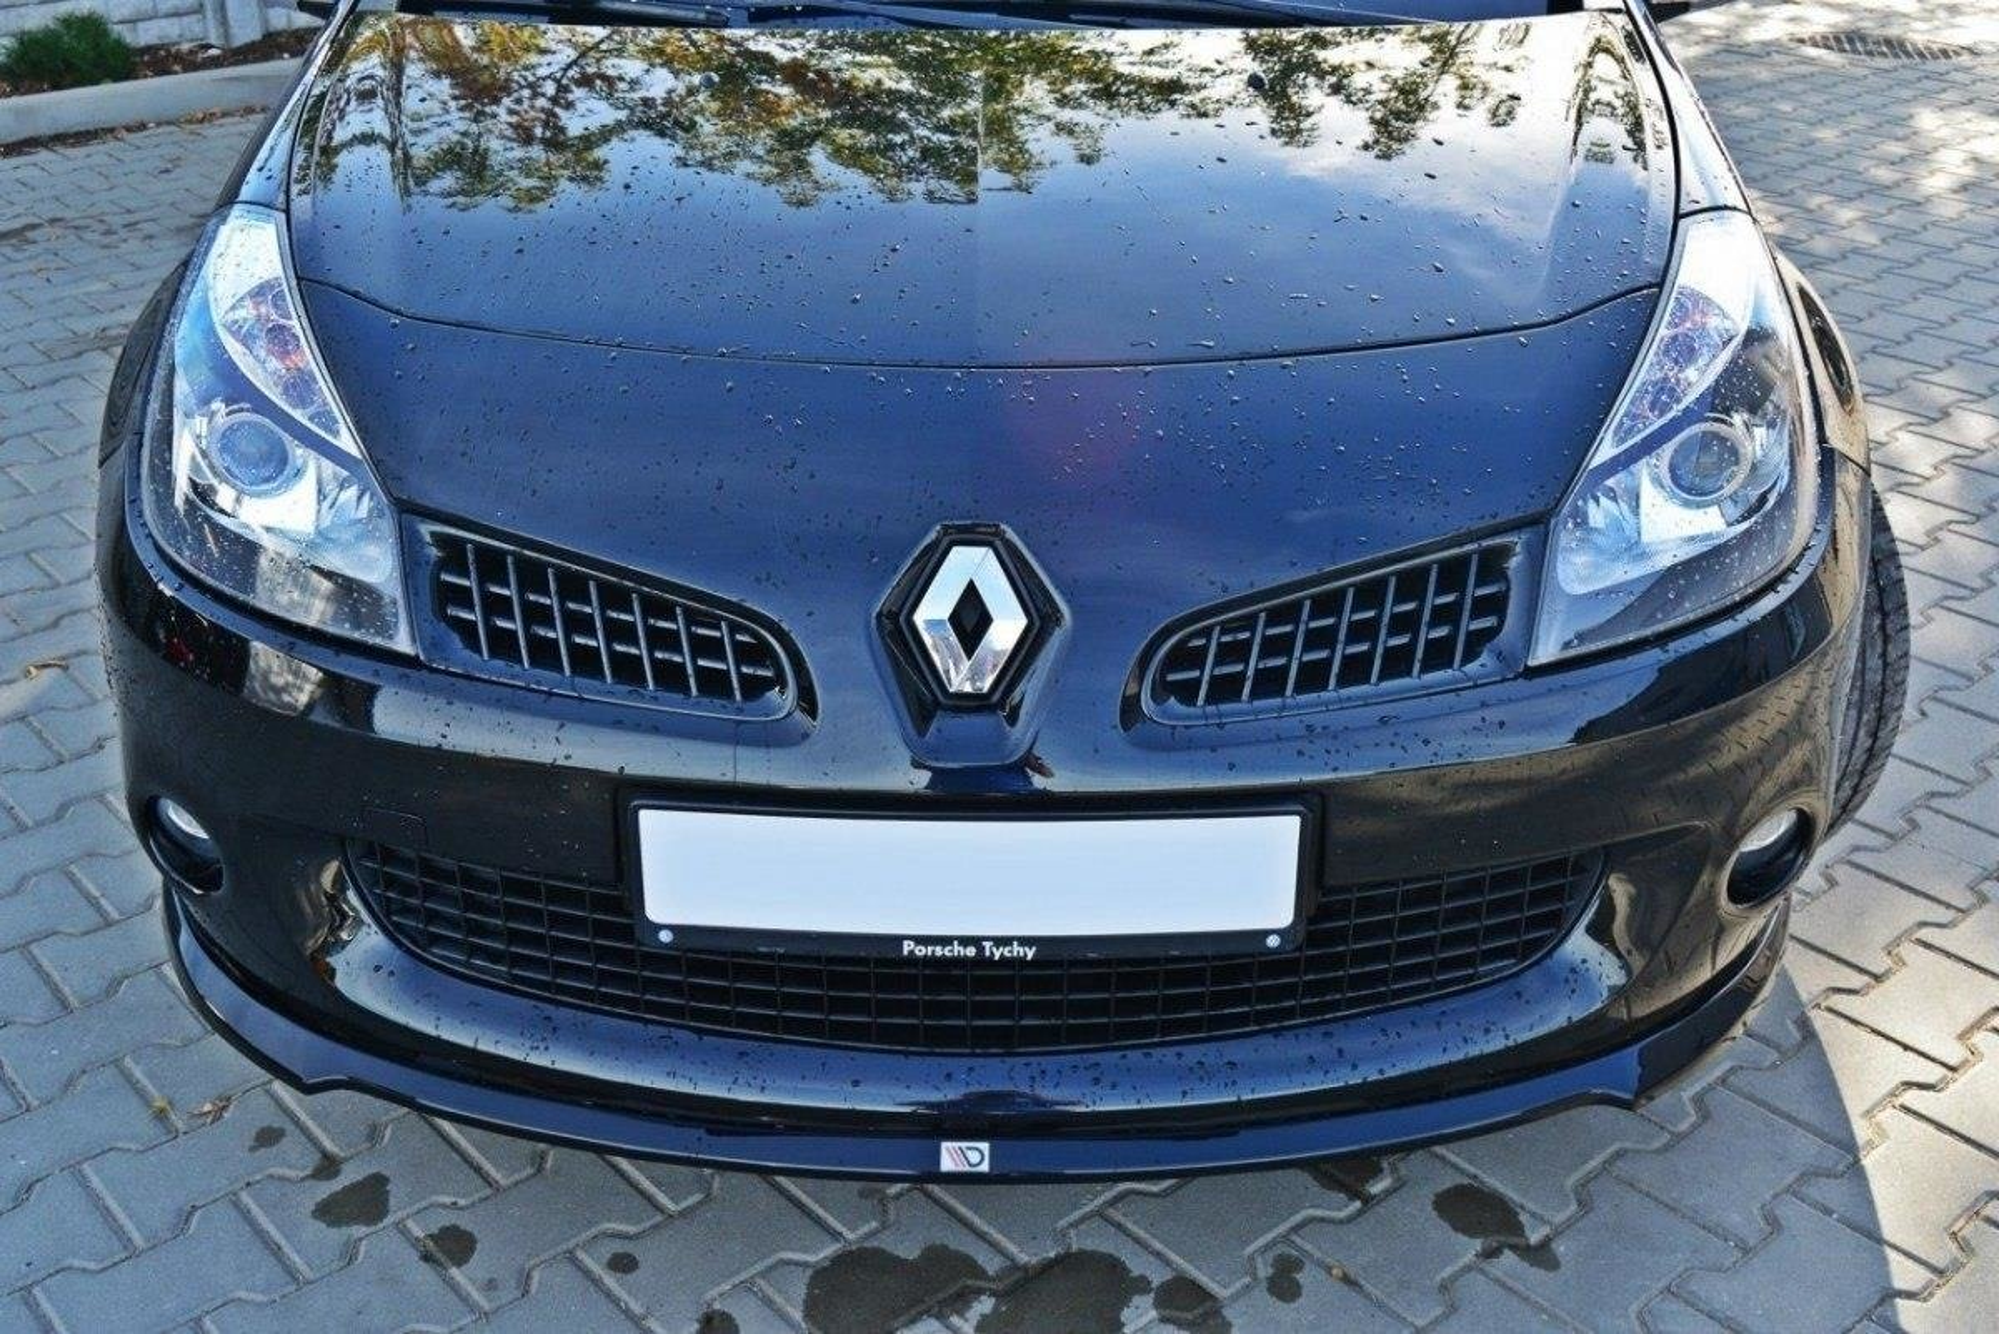 Lame Du Pare Chocs Avant Renault Clio Iii Rs